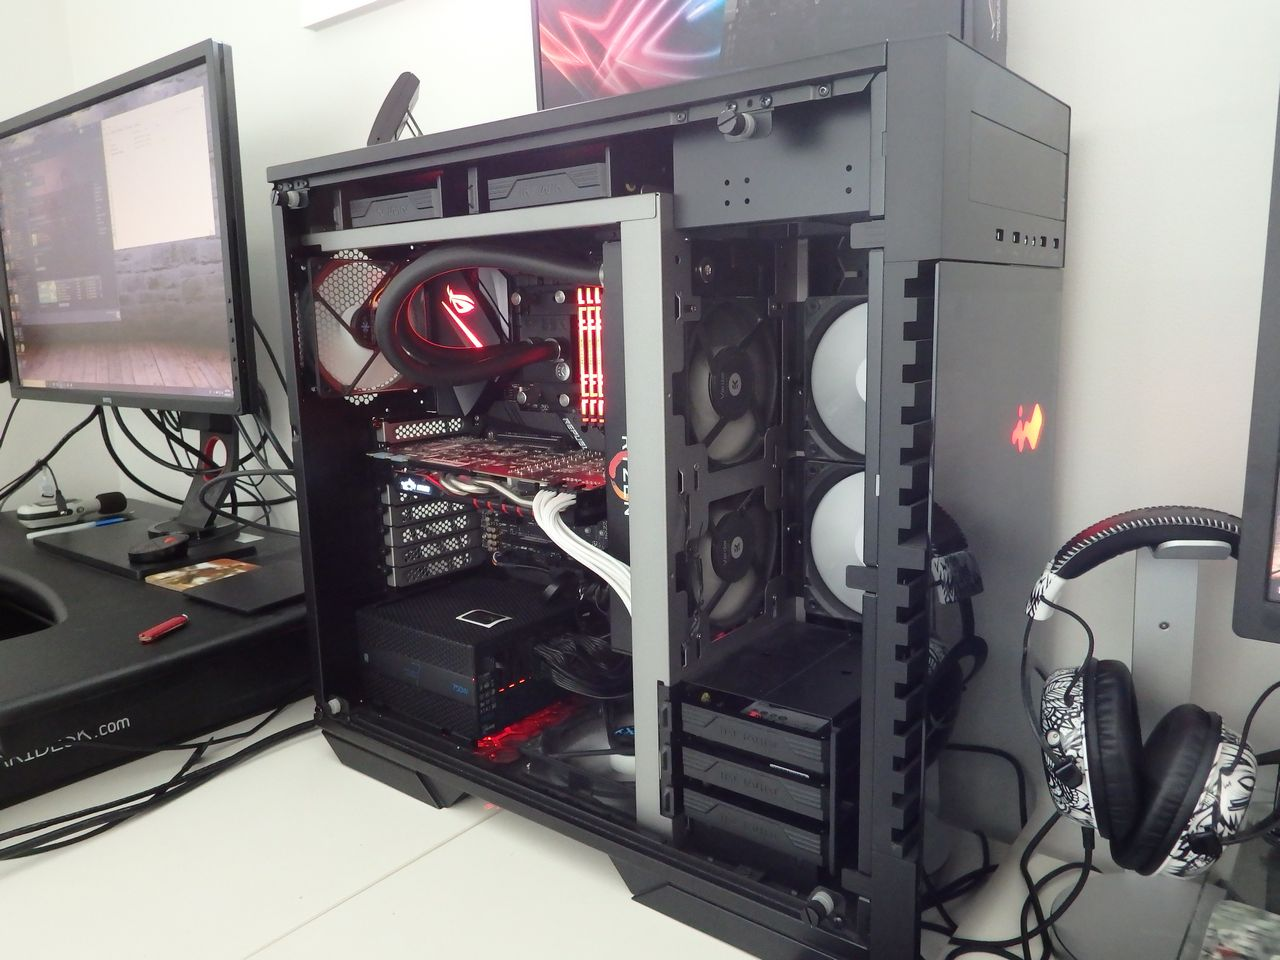 ASUS_STRIX-X470-F-Gaming-hyperX01